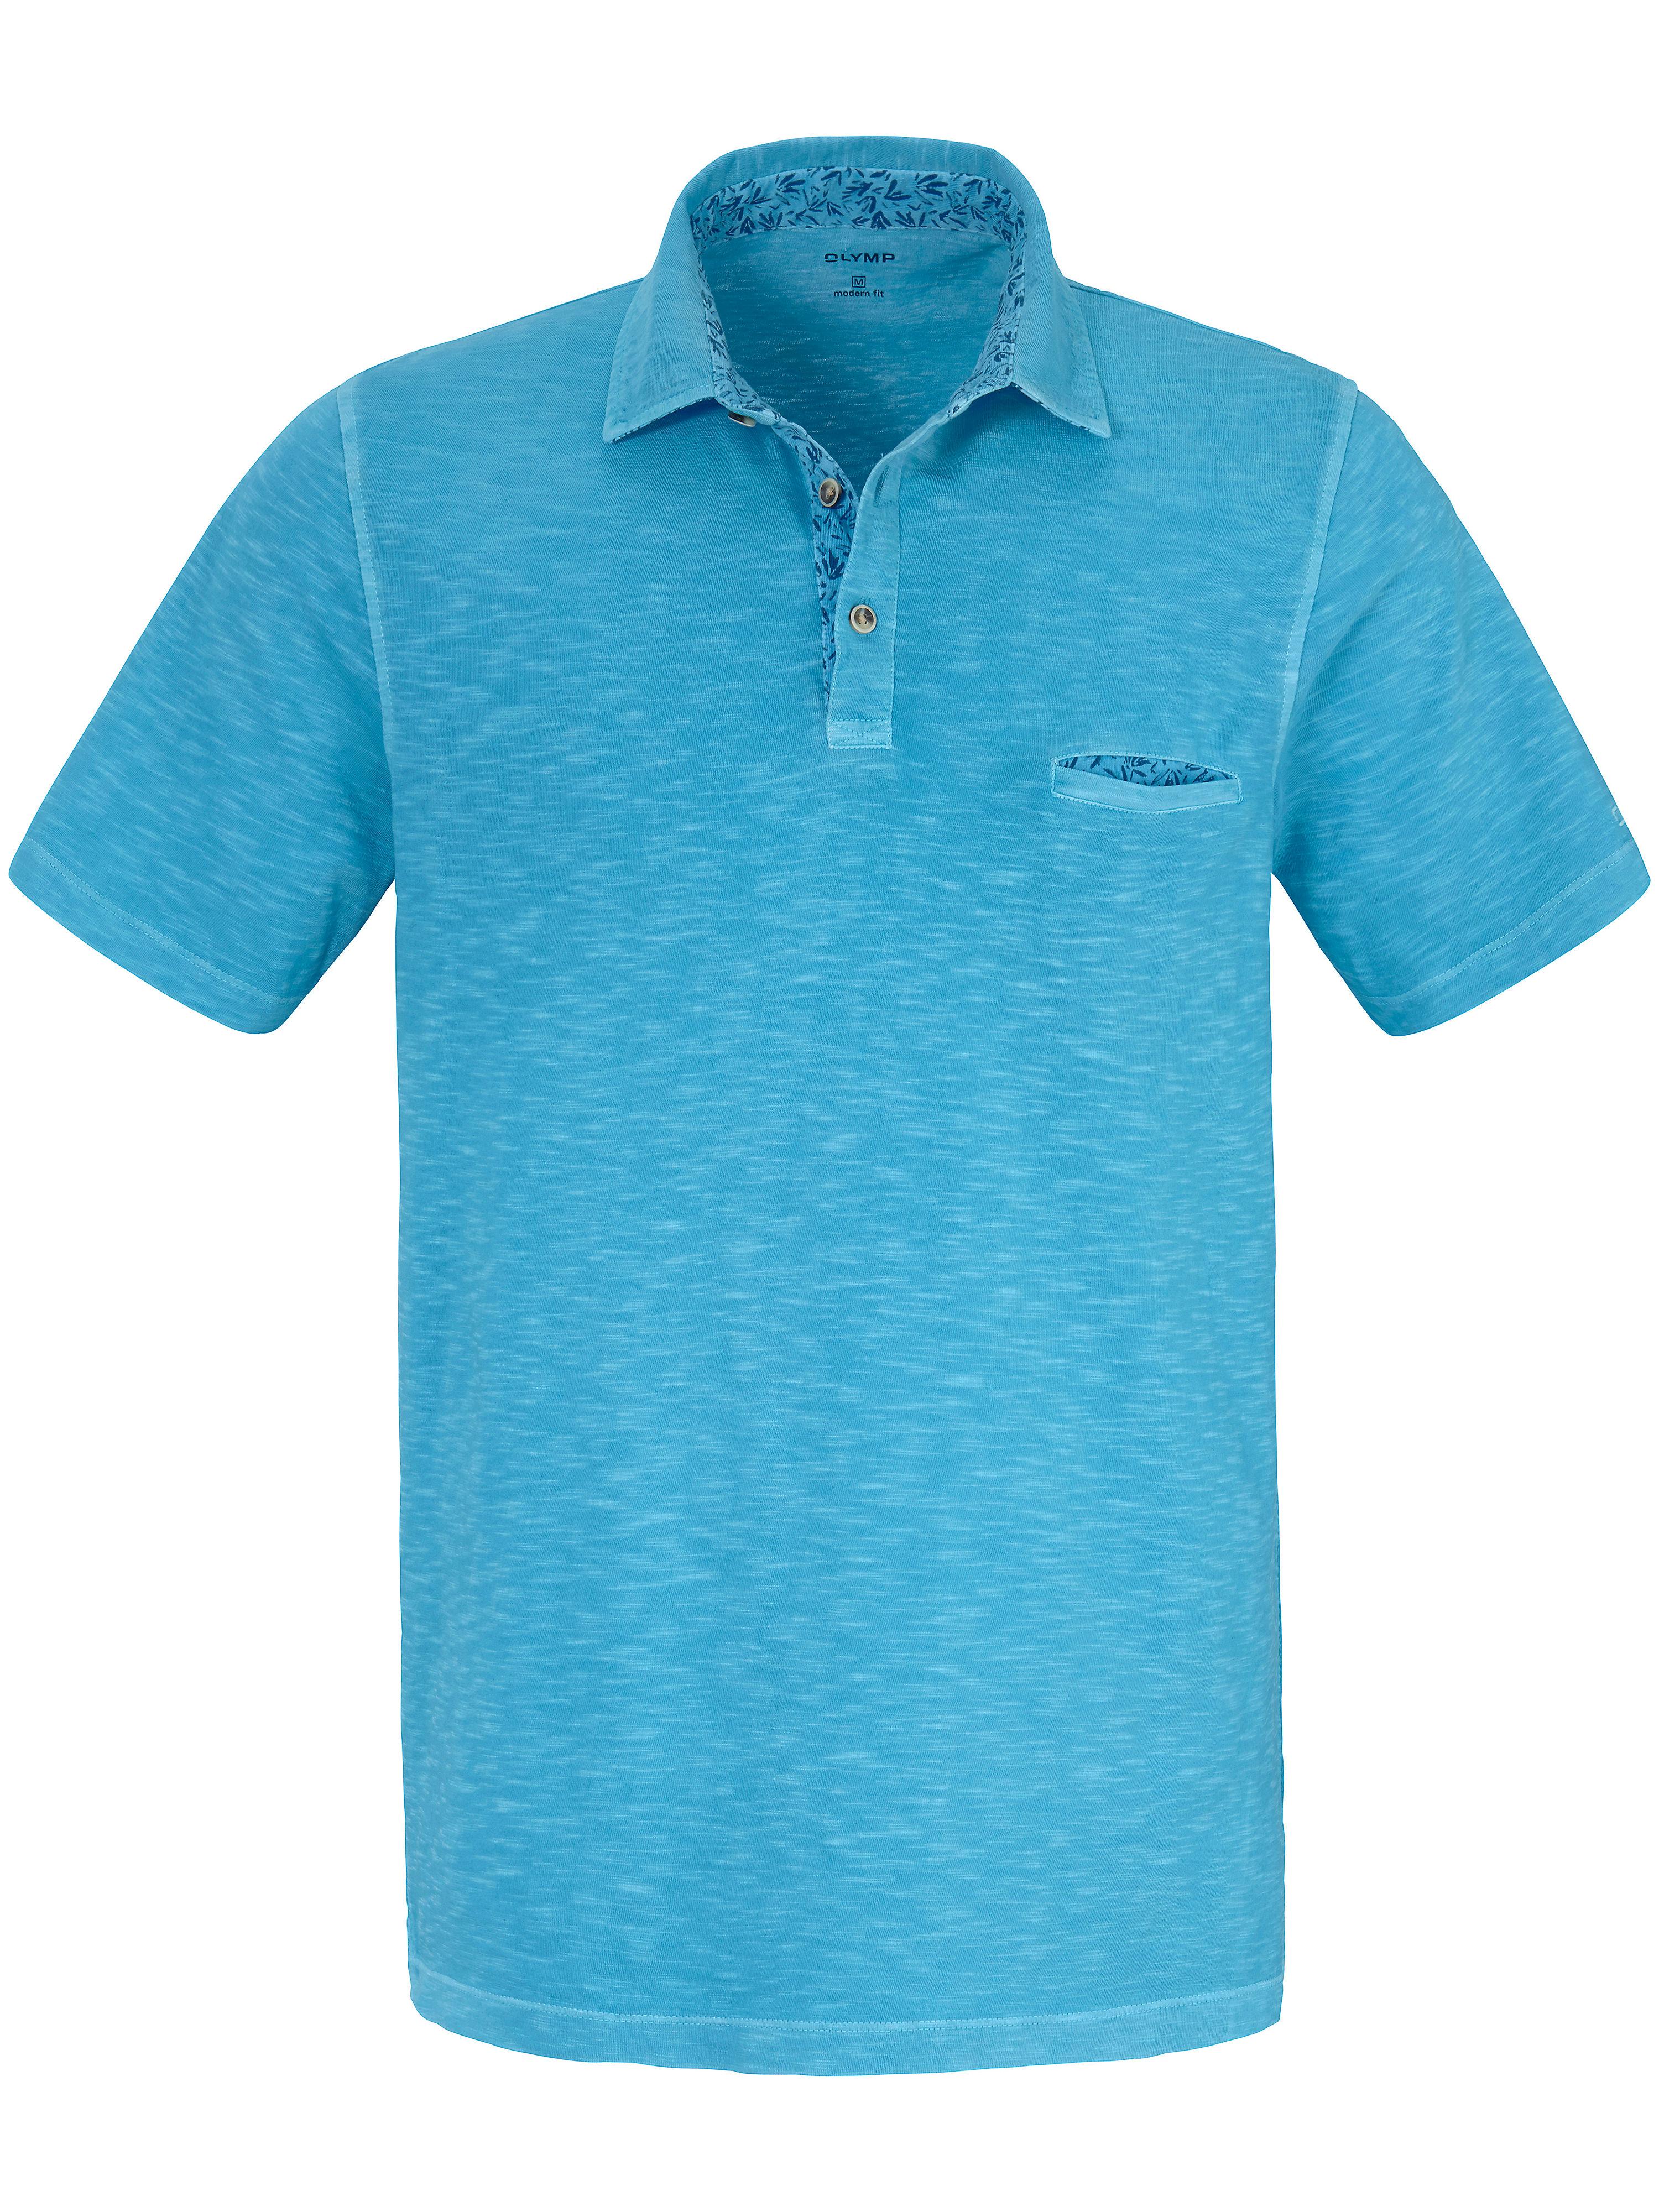 Le polo 100% coton  Olymp turquoise